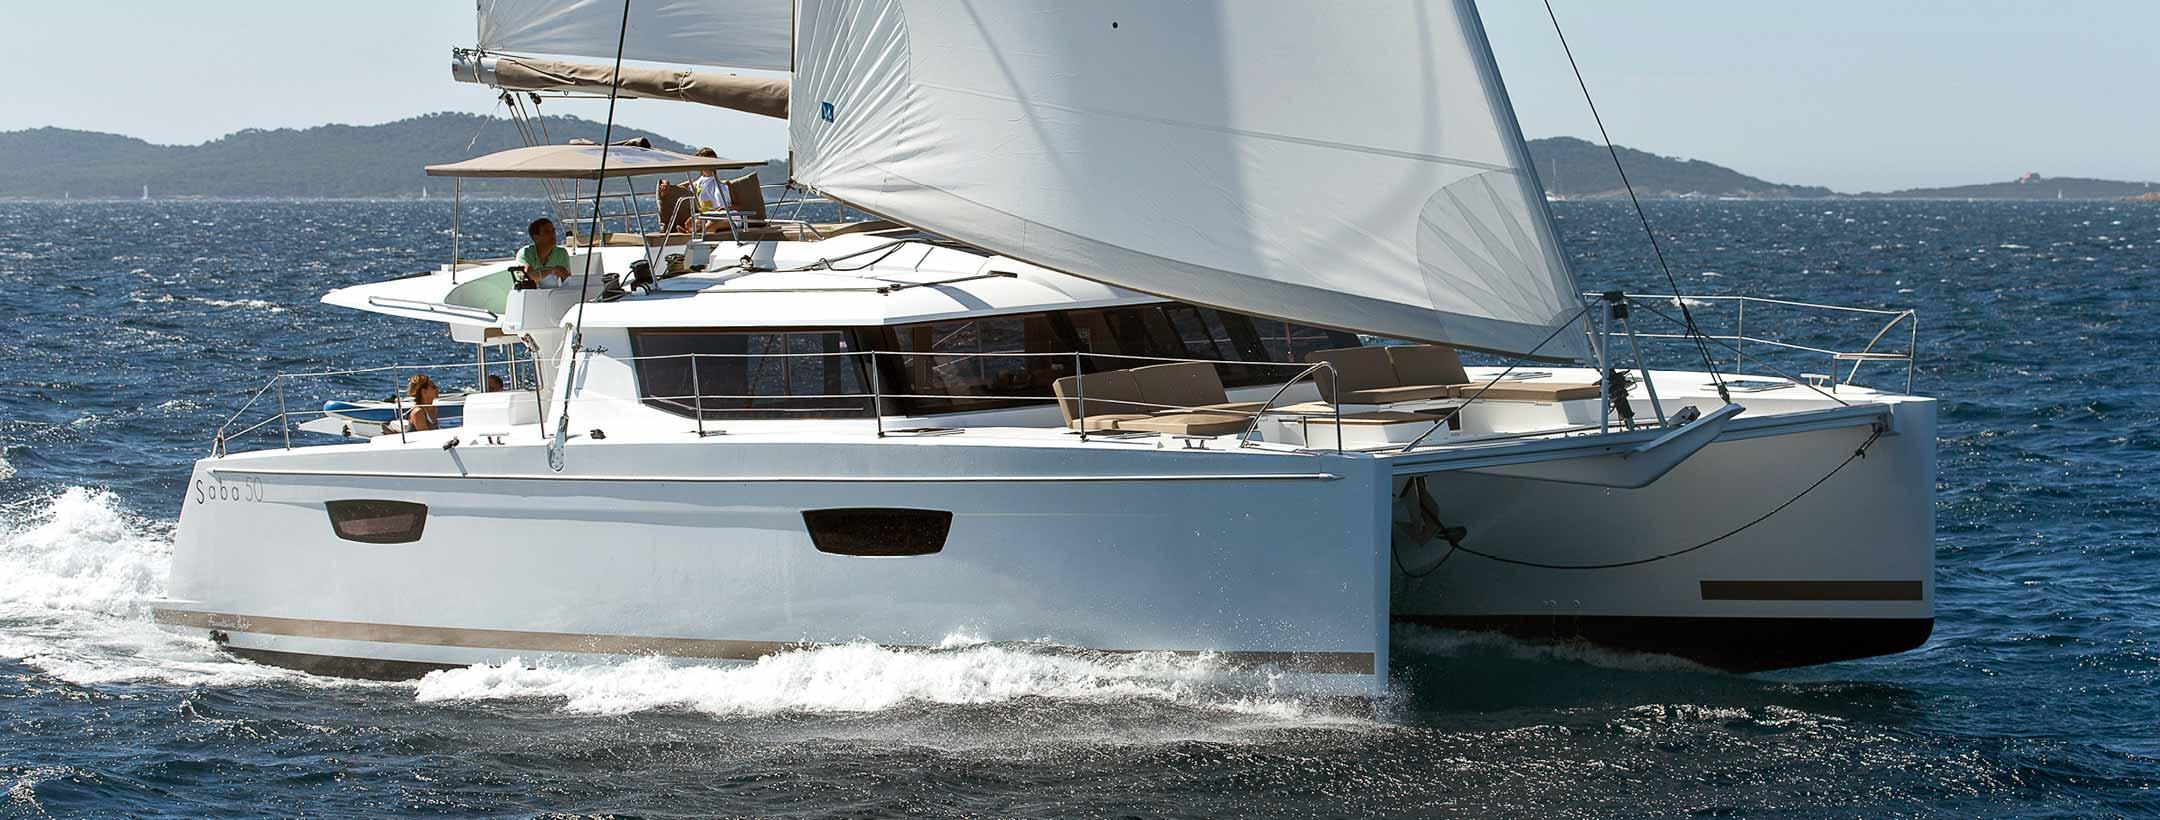 TradeWinds 52 Cruising Class Yacht